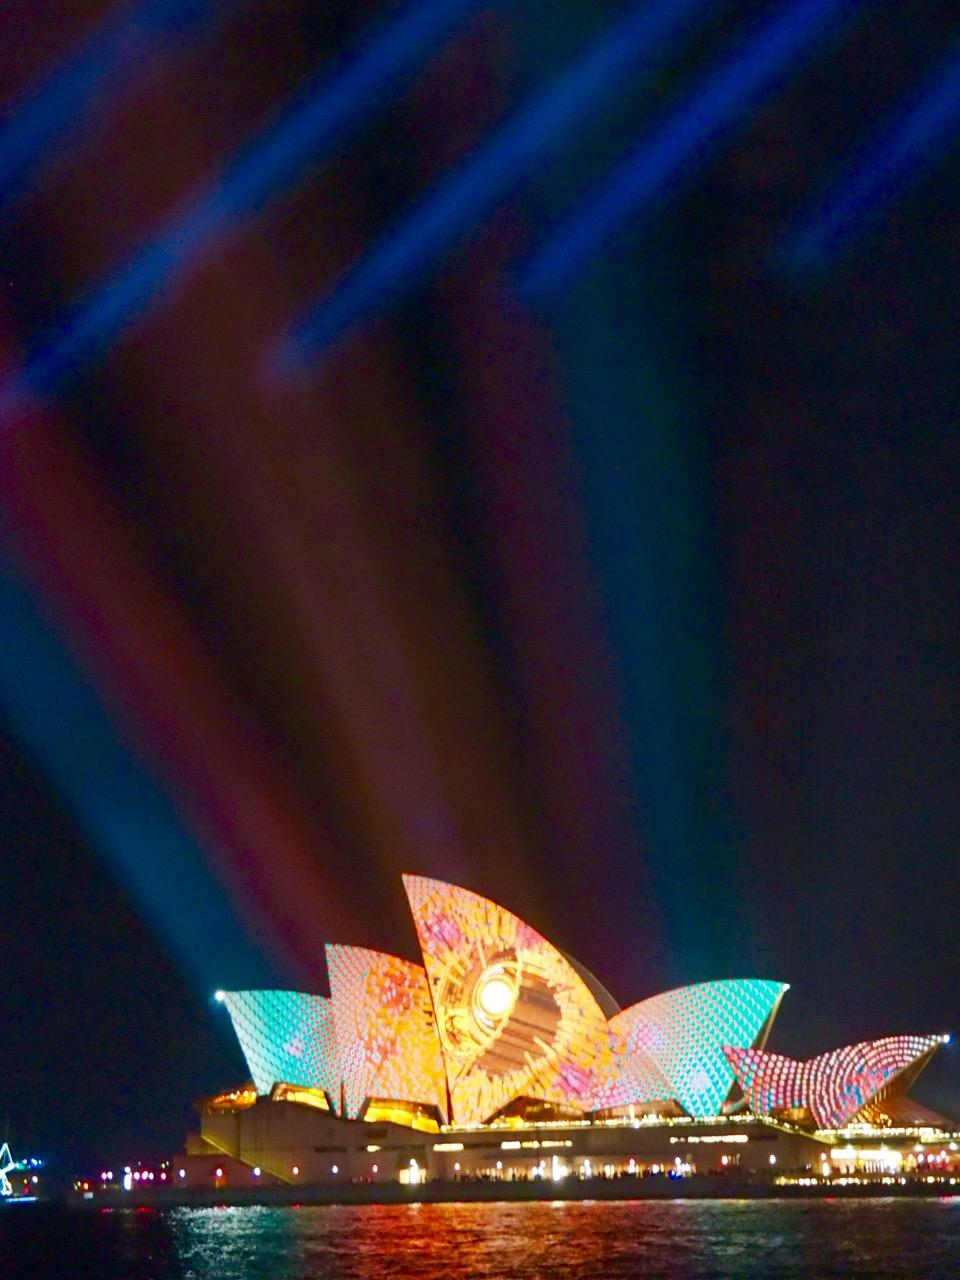 Light show over the Opera House